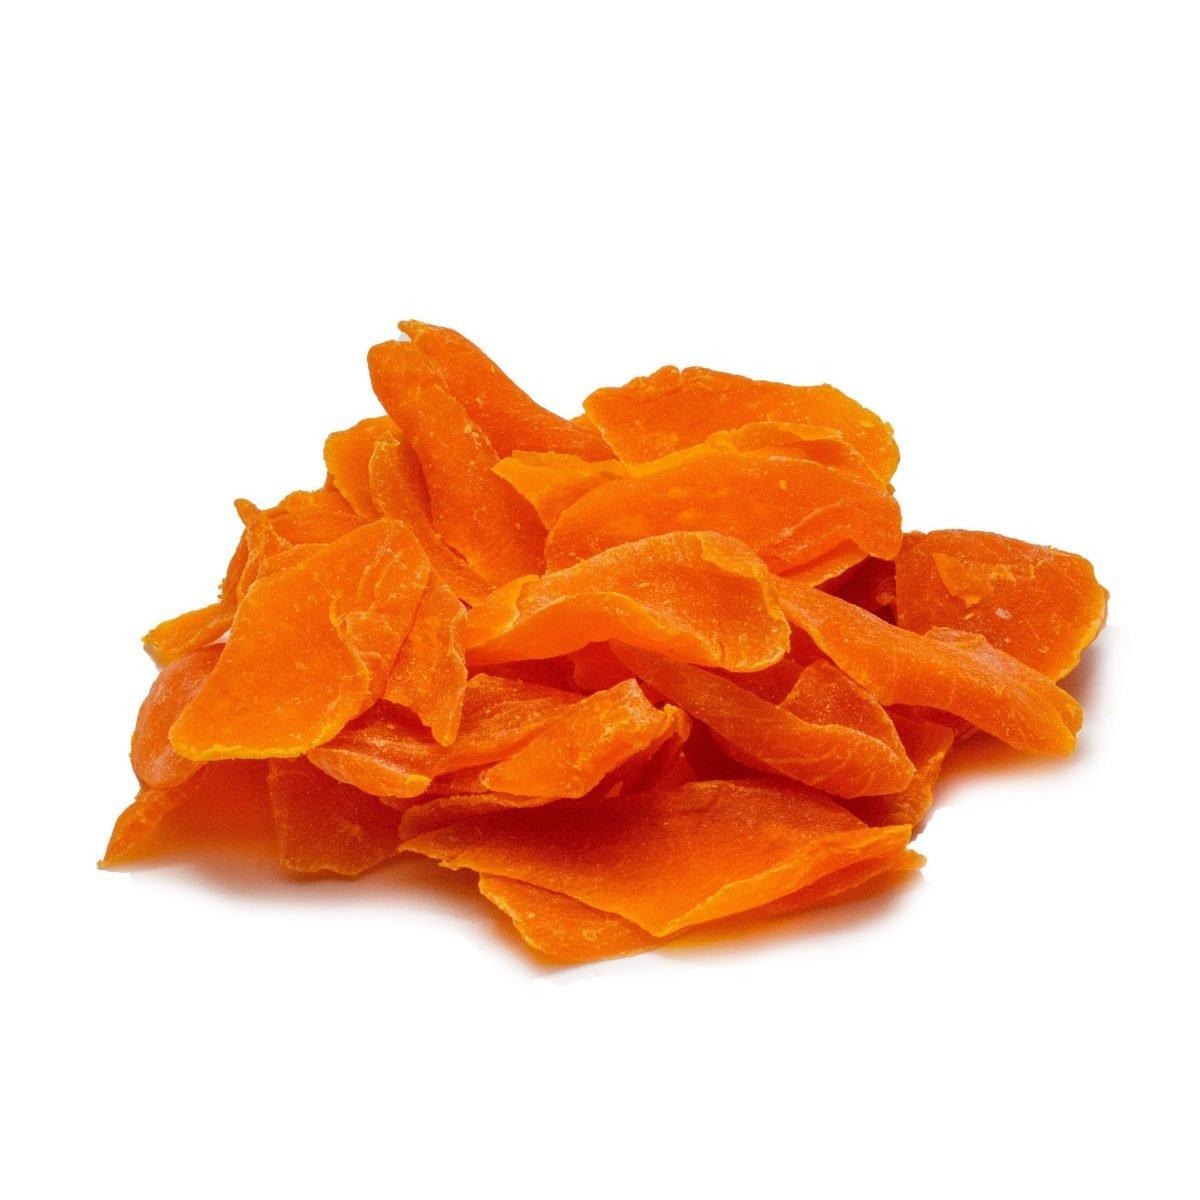 Mango Slices Sweetened With So2 Scaled